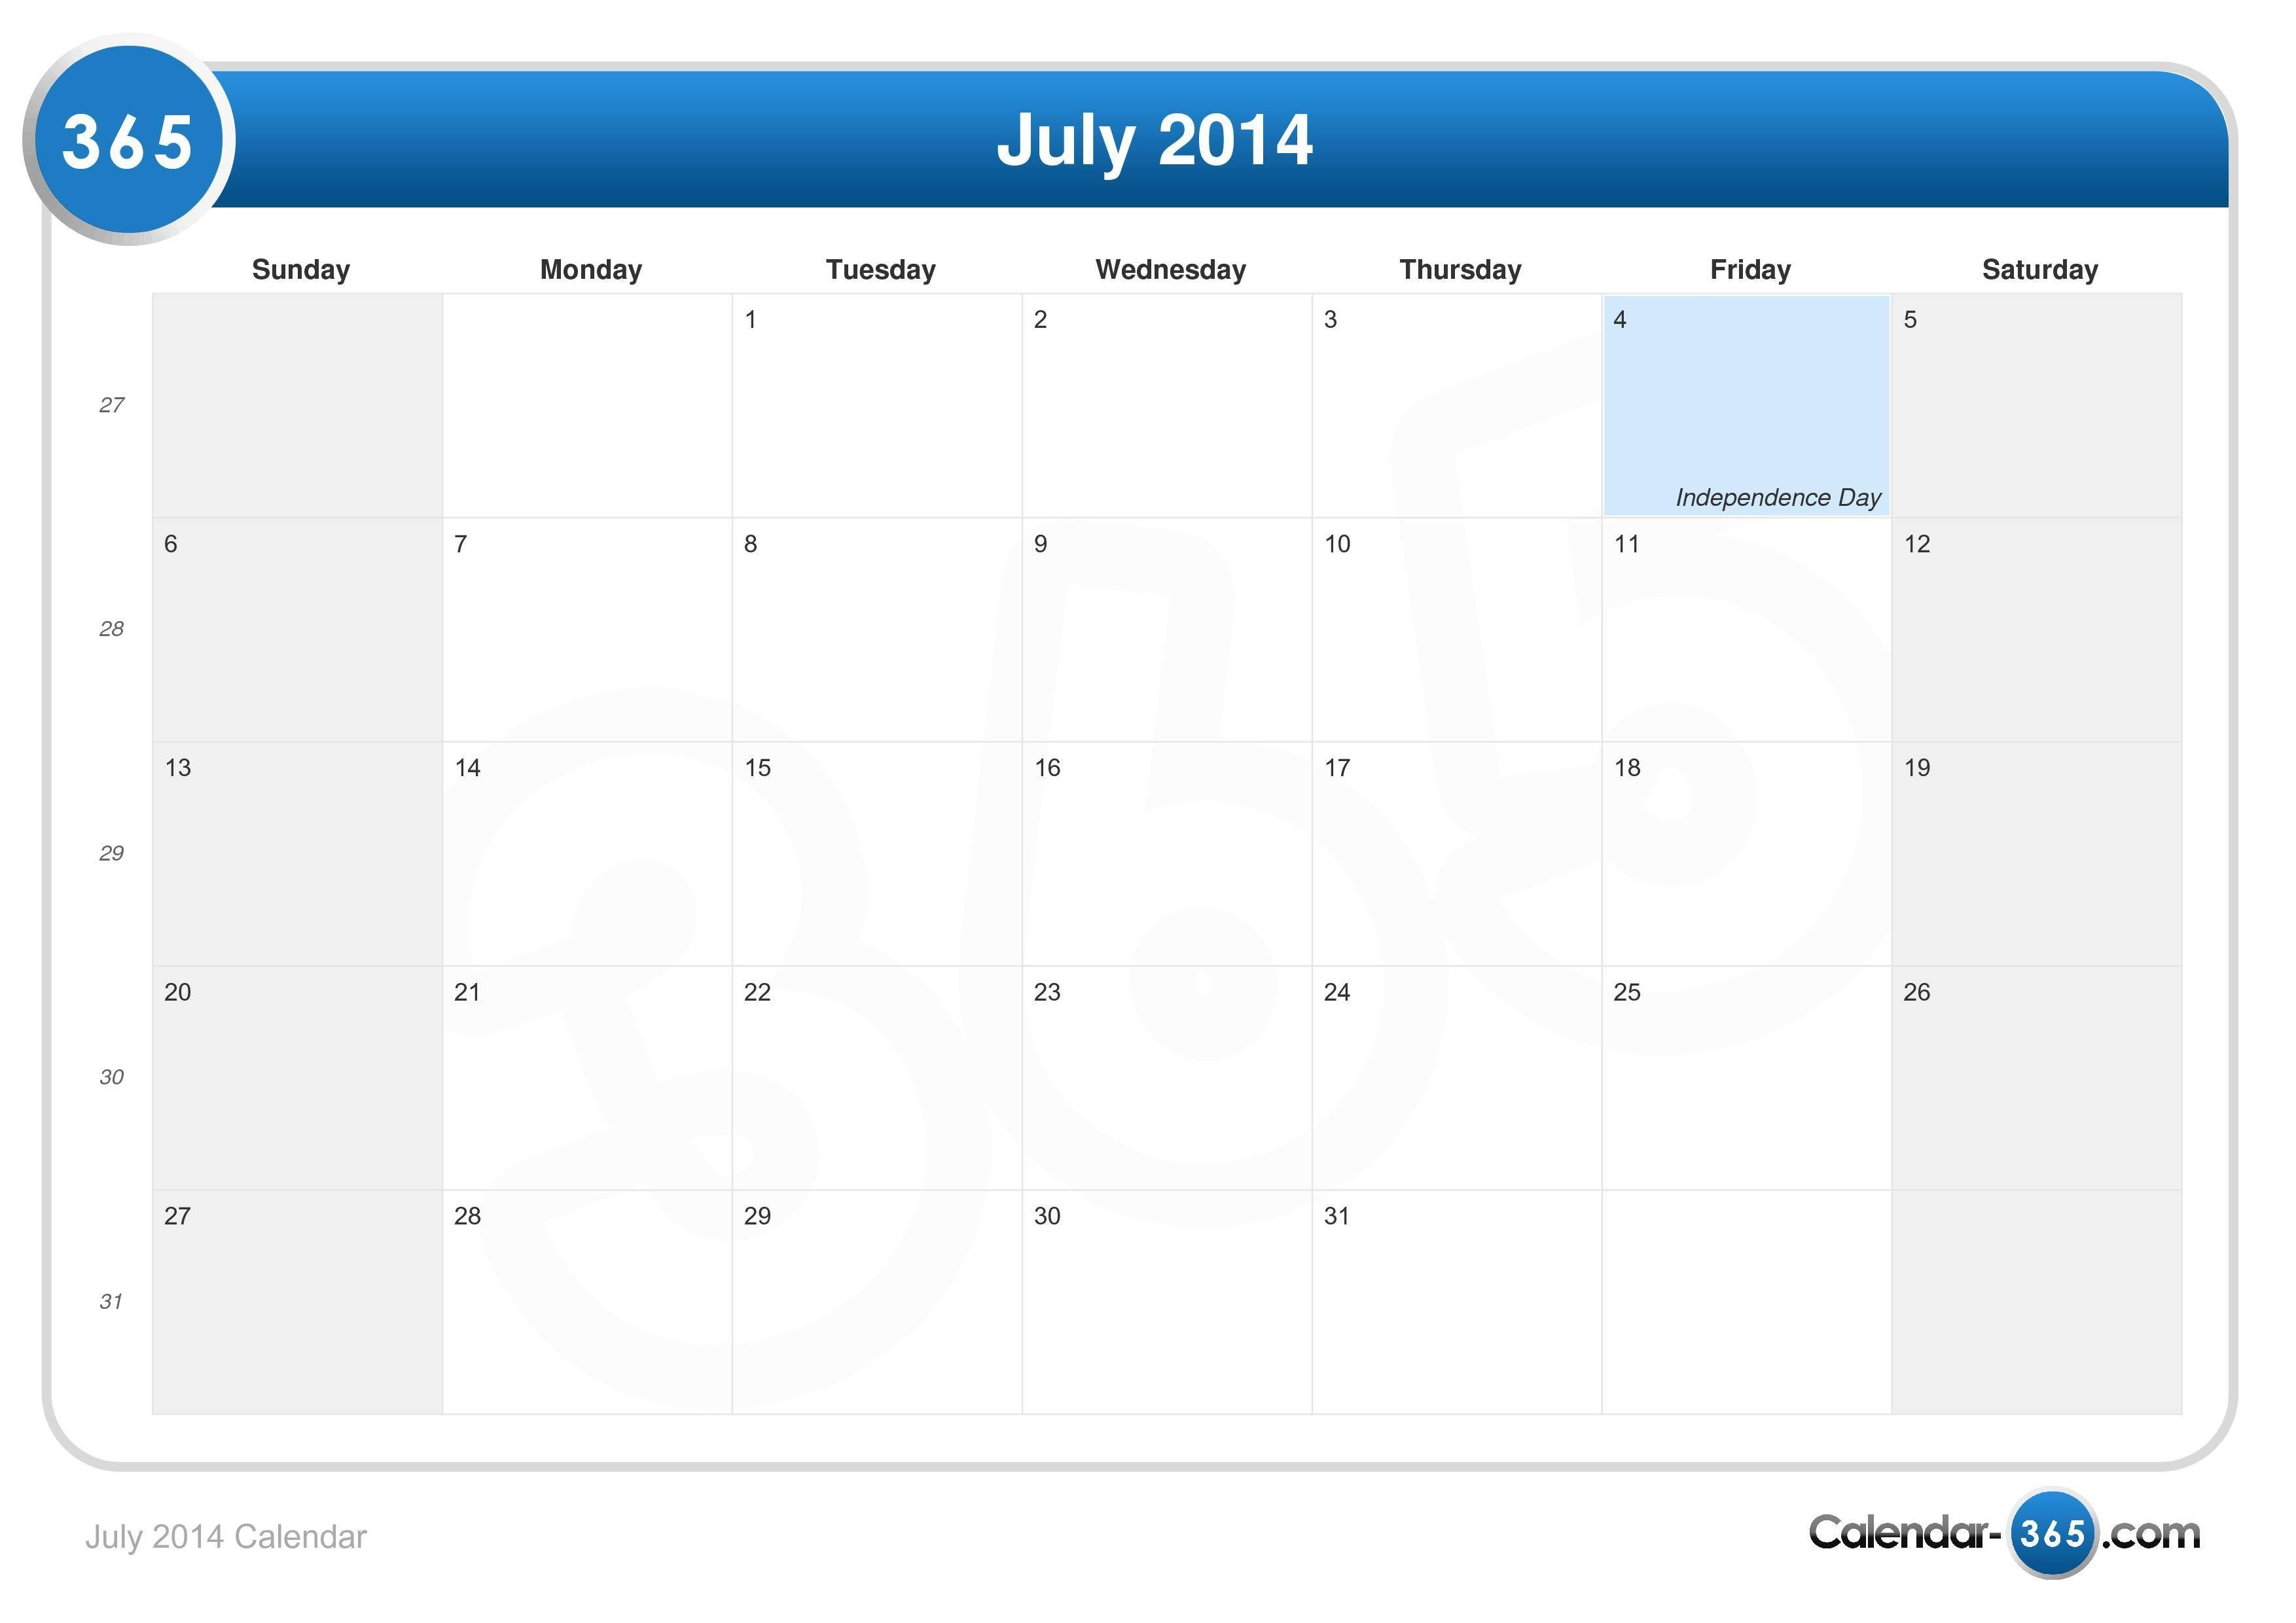 July 2014 Calendar Calendar Printables December Calendar 2019 Calendar